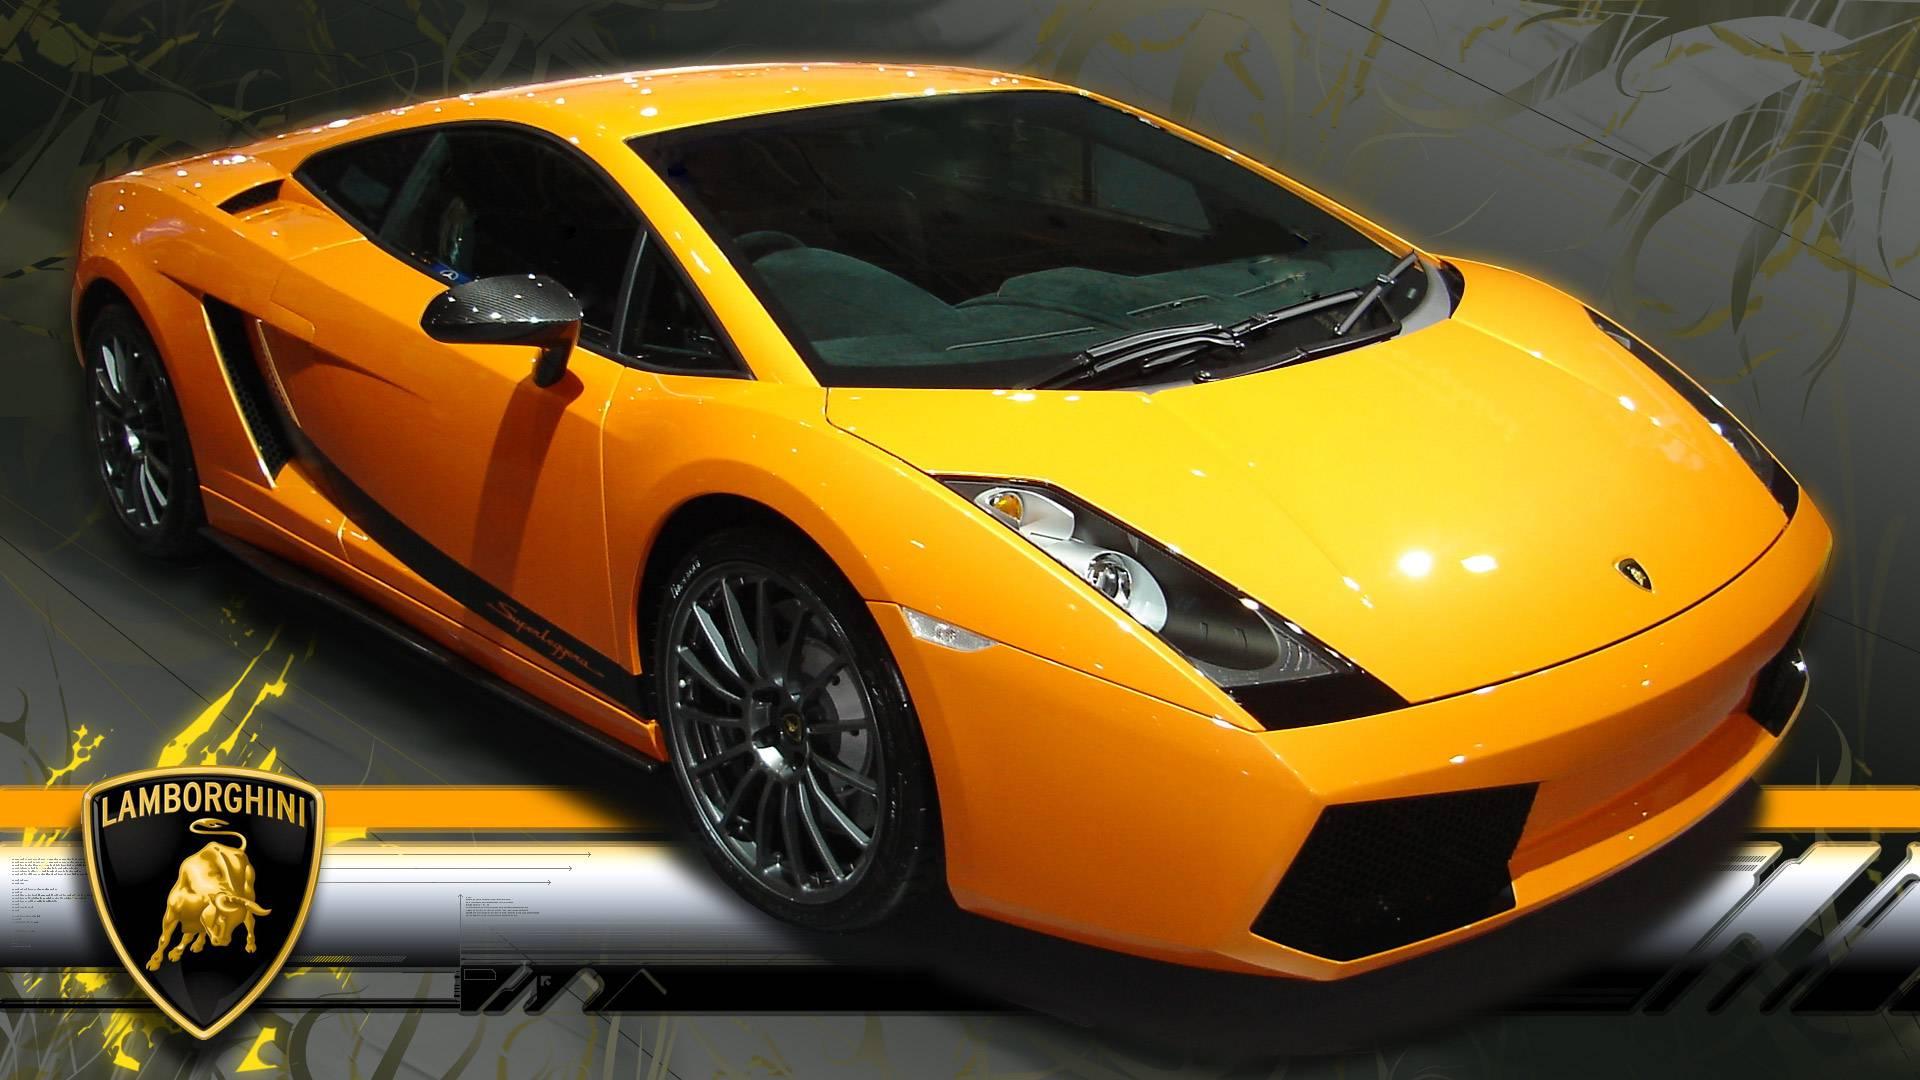 HD Lamborghini Wallpapers HD Wallpapers 1920x1080